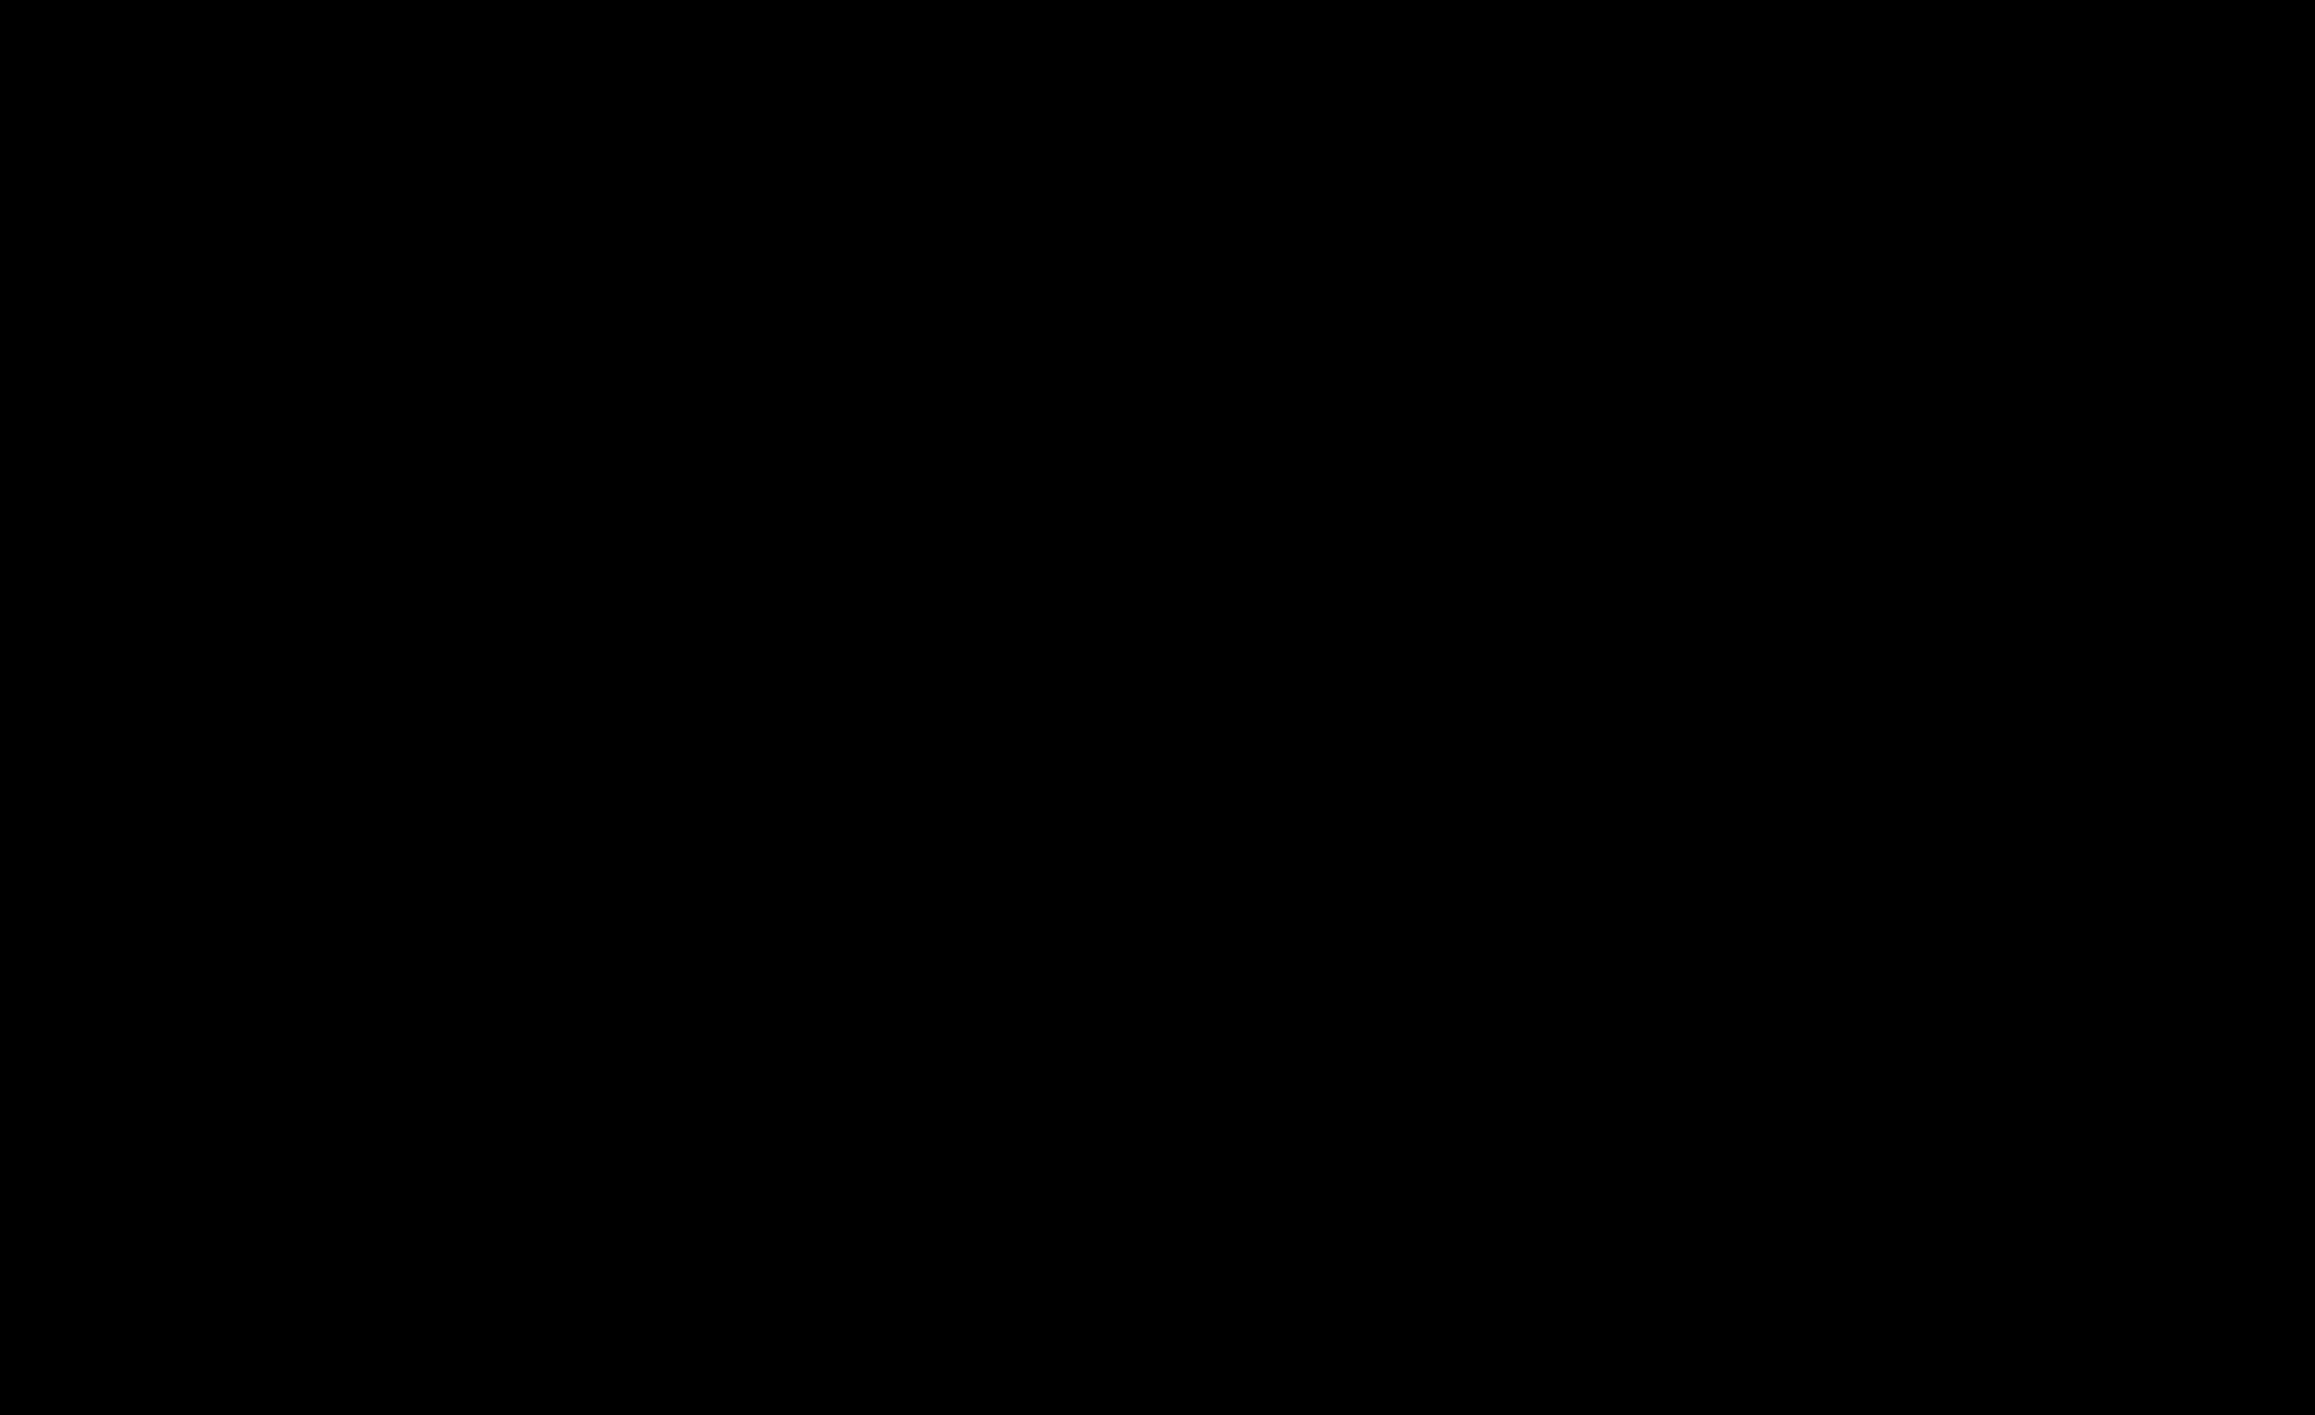 2315x1415 Clipart